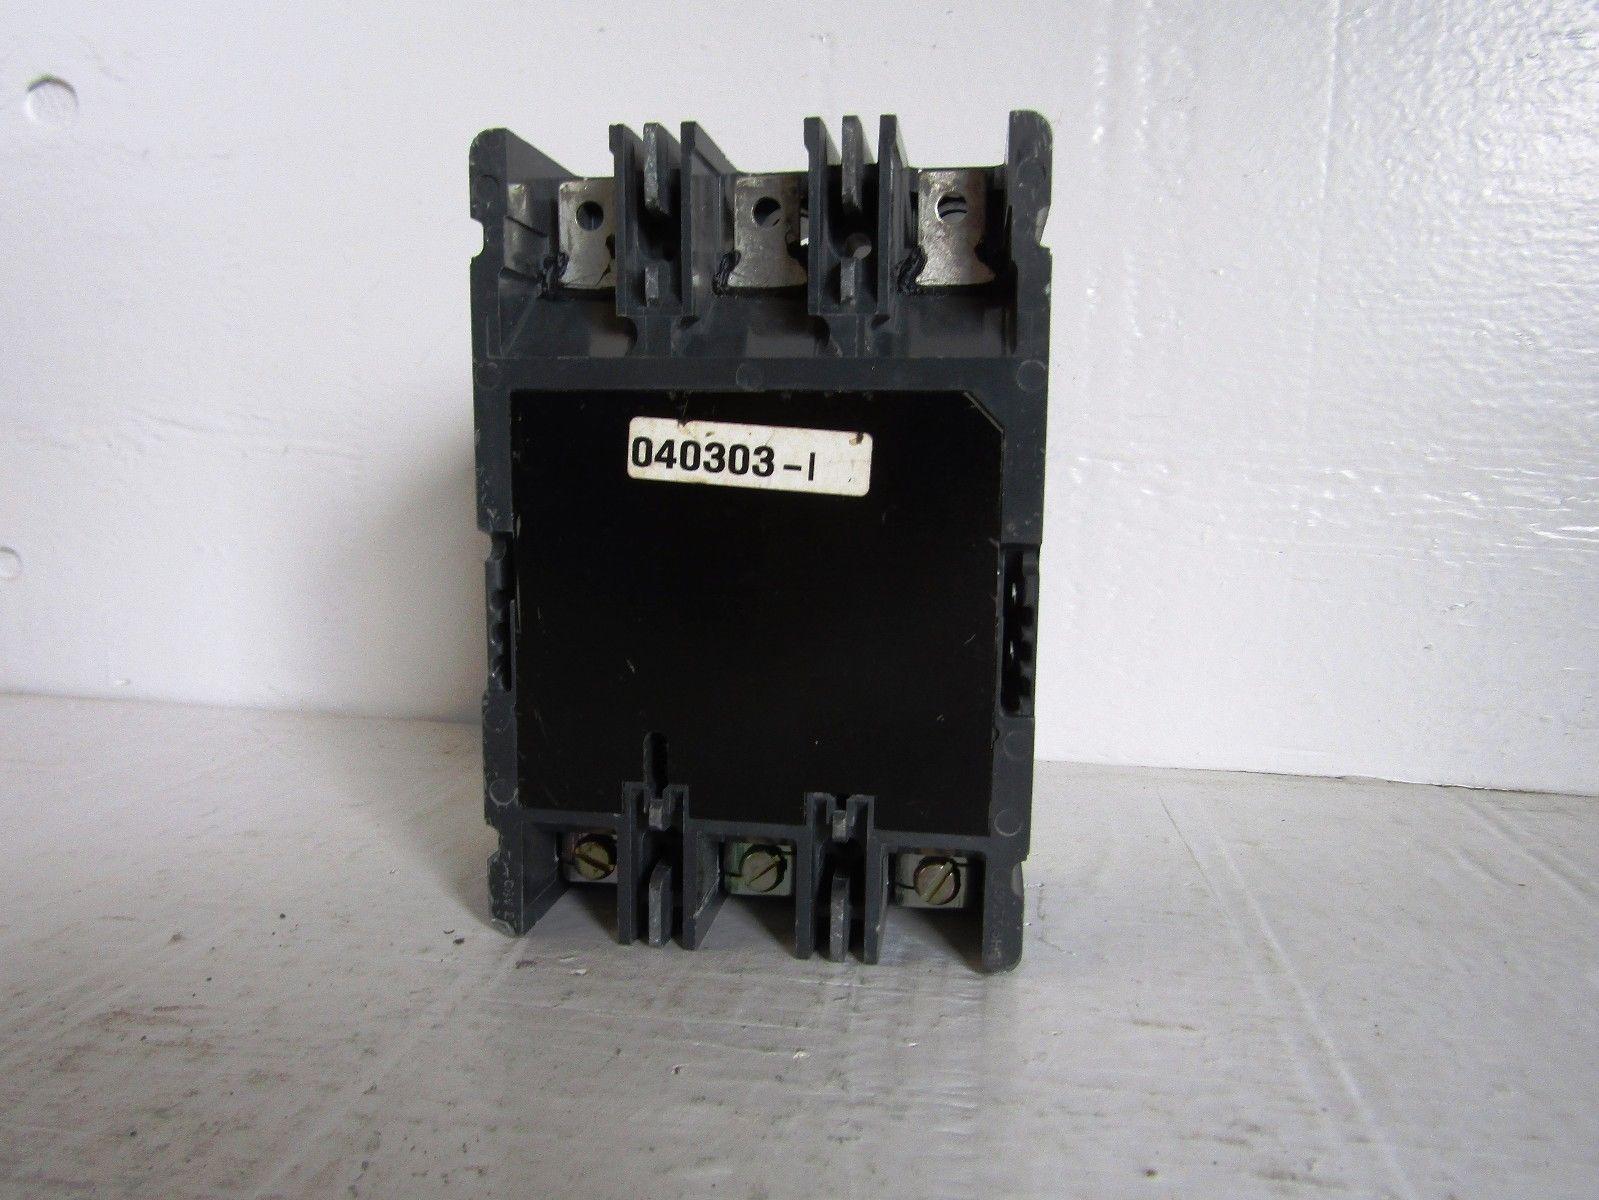 Cutler Hammer HFD3045 600V 45A 3P Industrial Circuit Breaker 331884291374 5?fit\=1599%2C1200\&ssl\=1 emergi lite wiring diagram wiring diagrams emergency lighting ctu wiring diagram at crackthecode.co